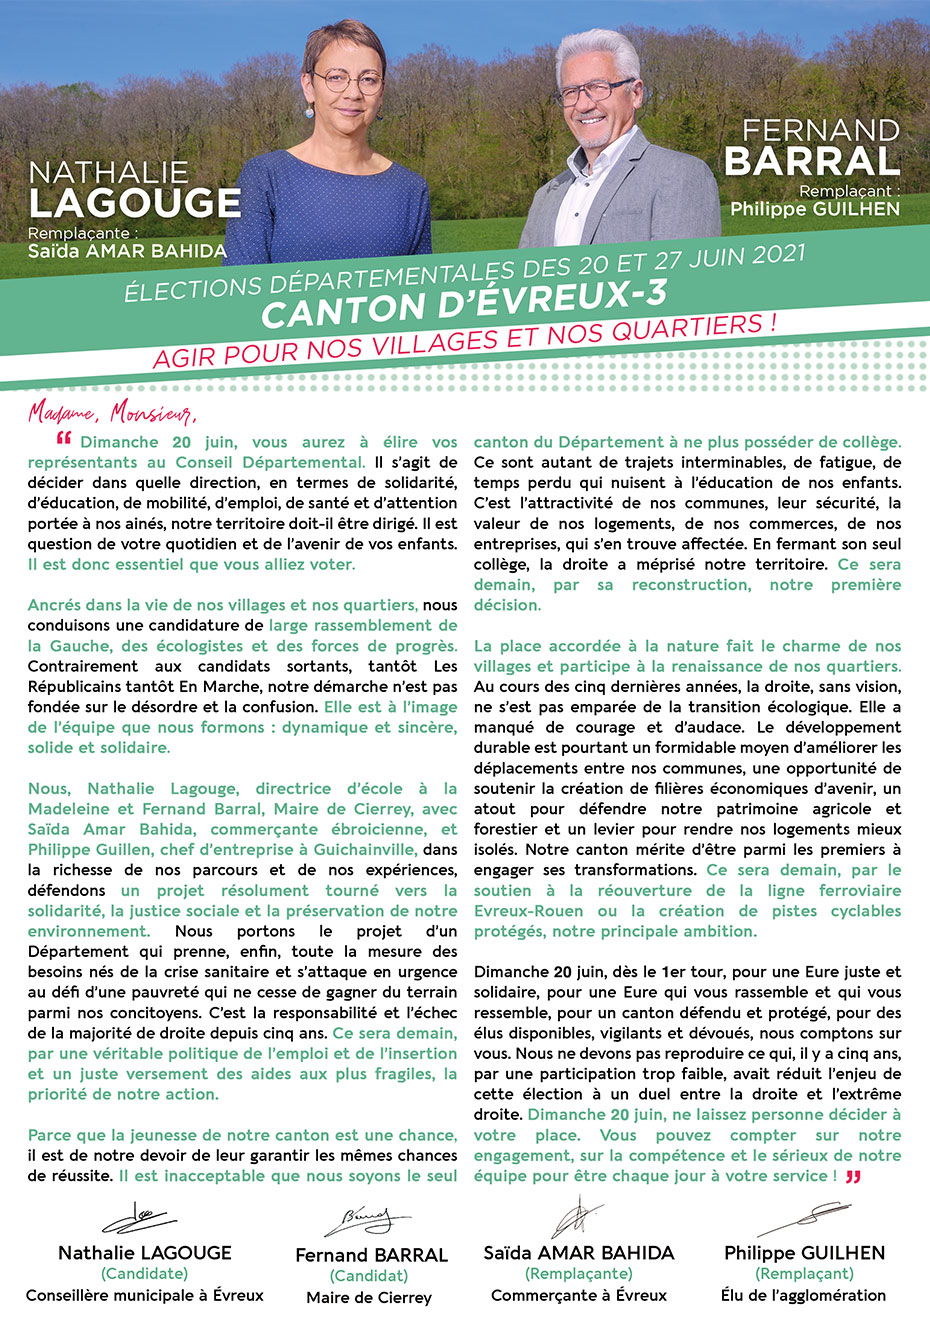 to-become-agence-communication-publicite-marketing-graphisme-digital-photos-videos-profession-de-foi-recto